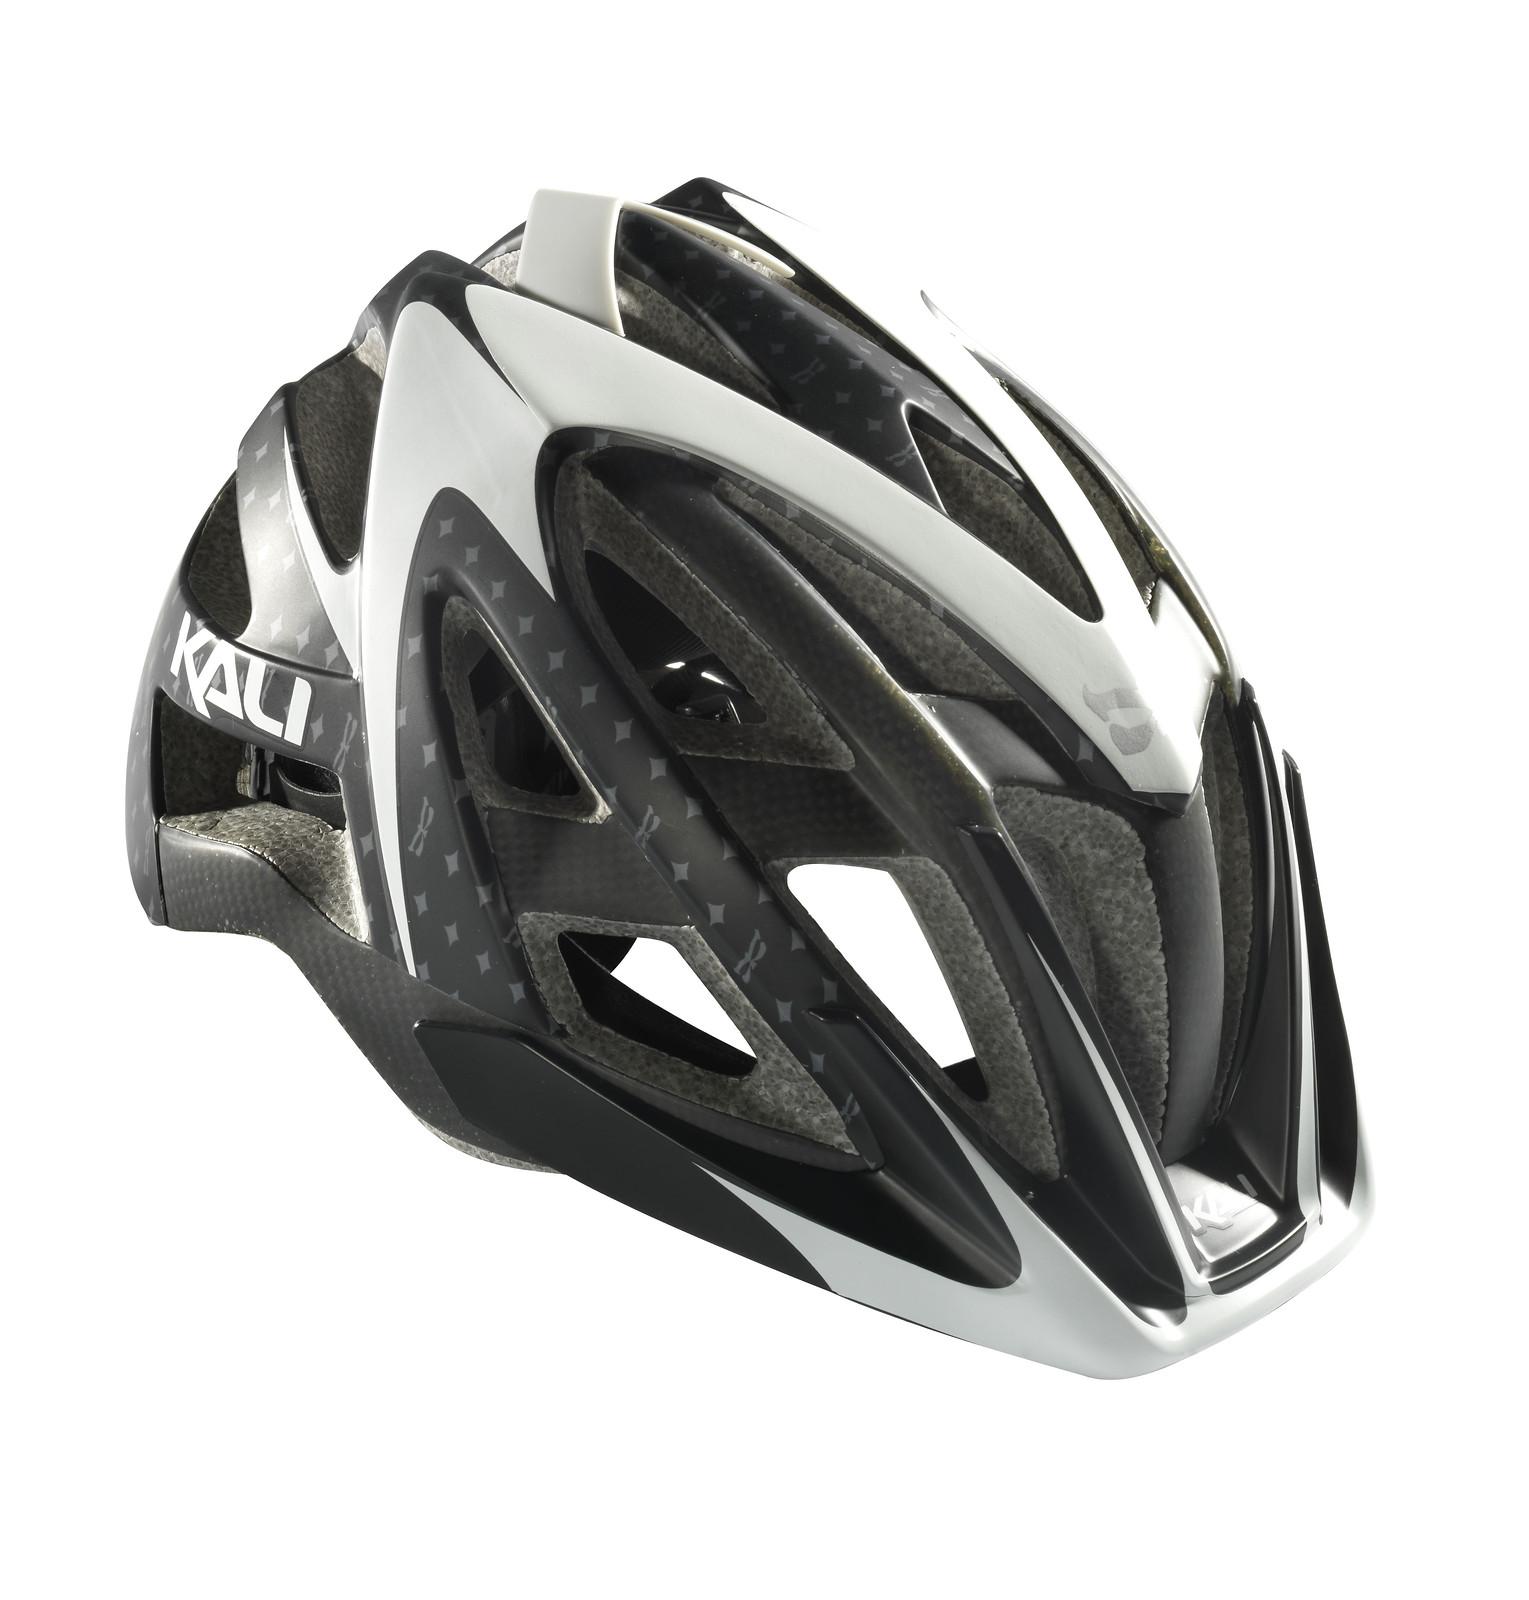 Kali Protectives Avita Composite Helmet CarbBlackAvitarght